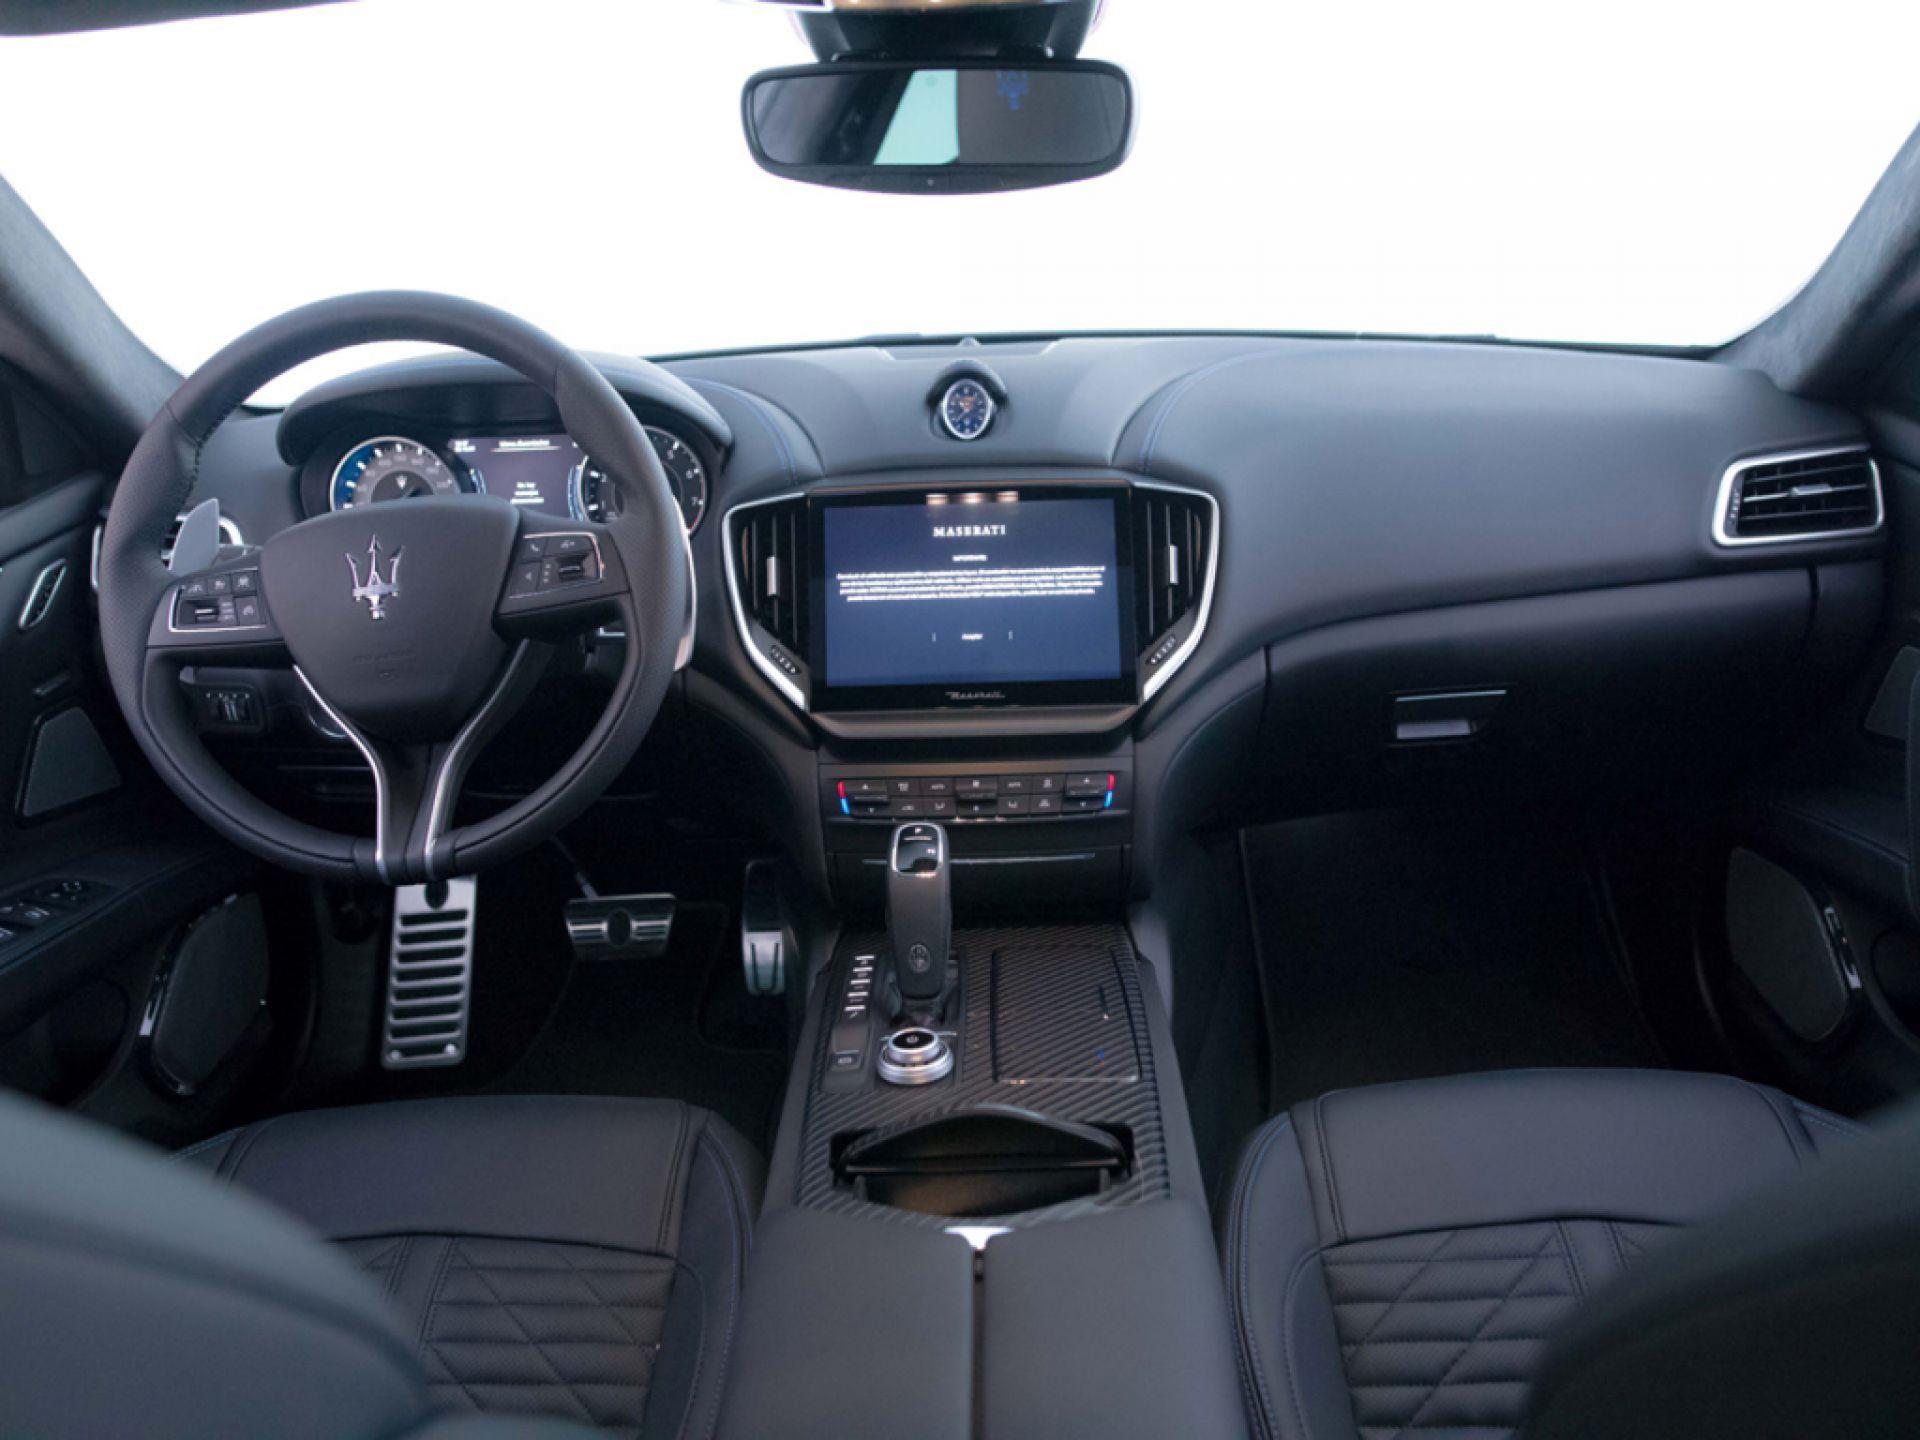 Maserati Ghibli GranSport 2.0 L4 Hybrid-Gasolina